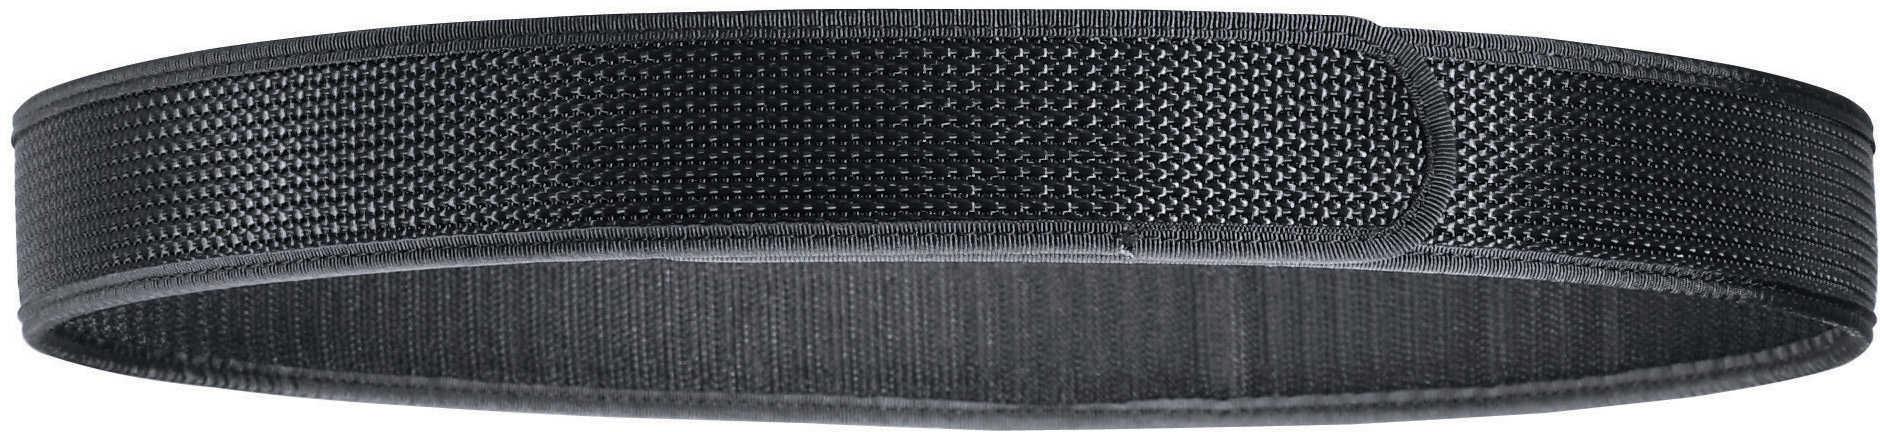 Bianchi 7205 Nylon Belt Liner Small Md: 17706